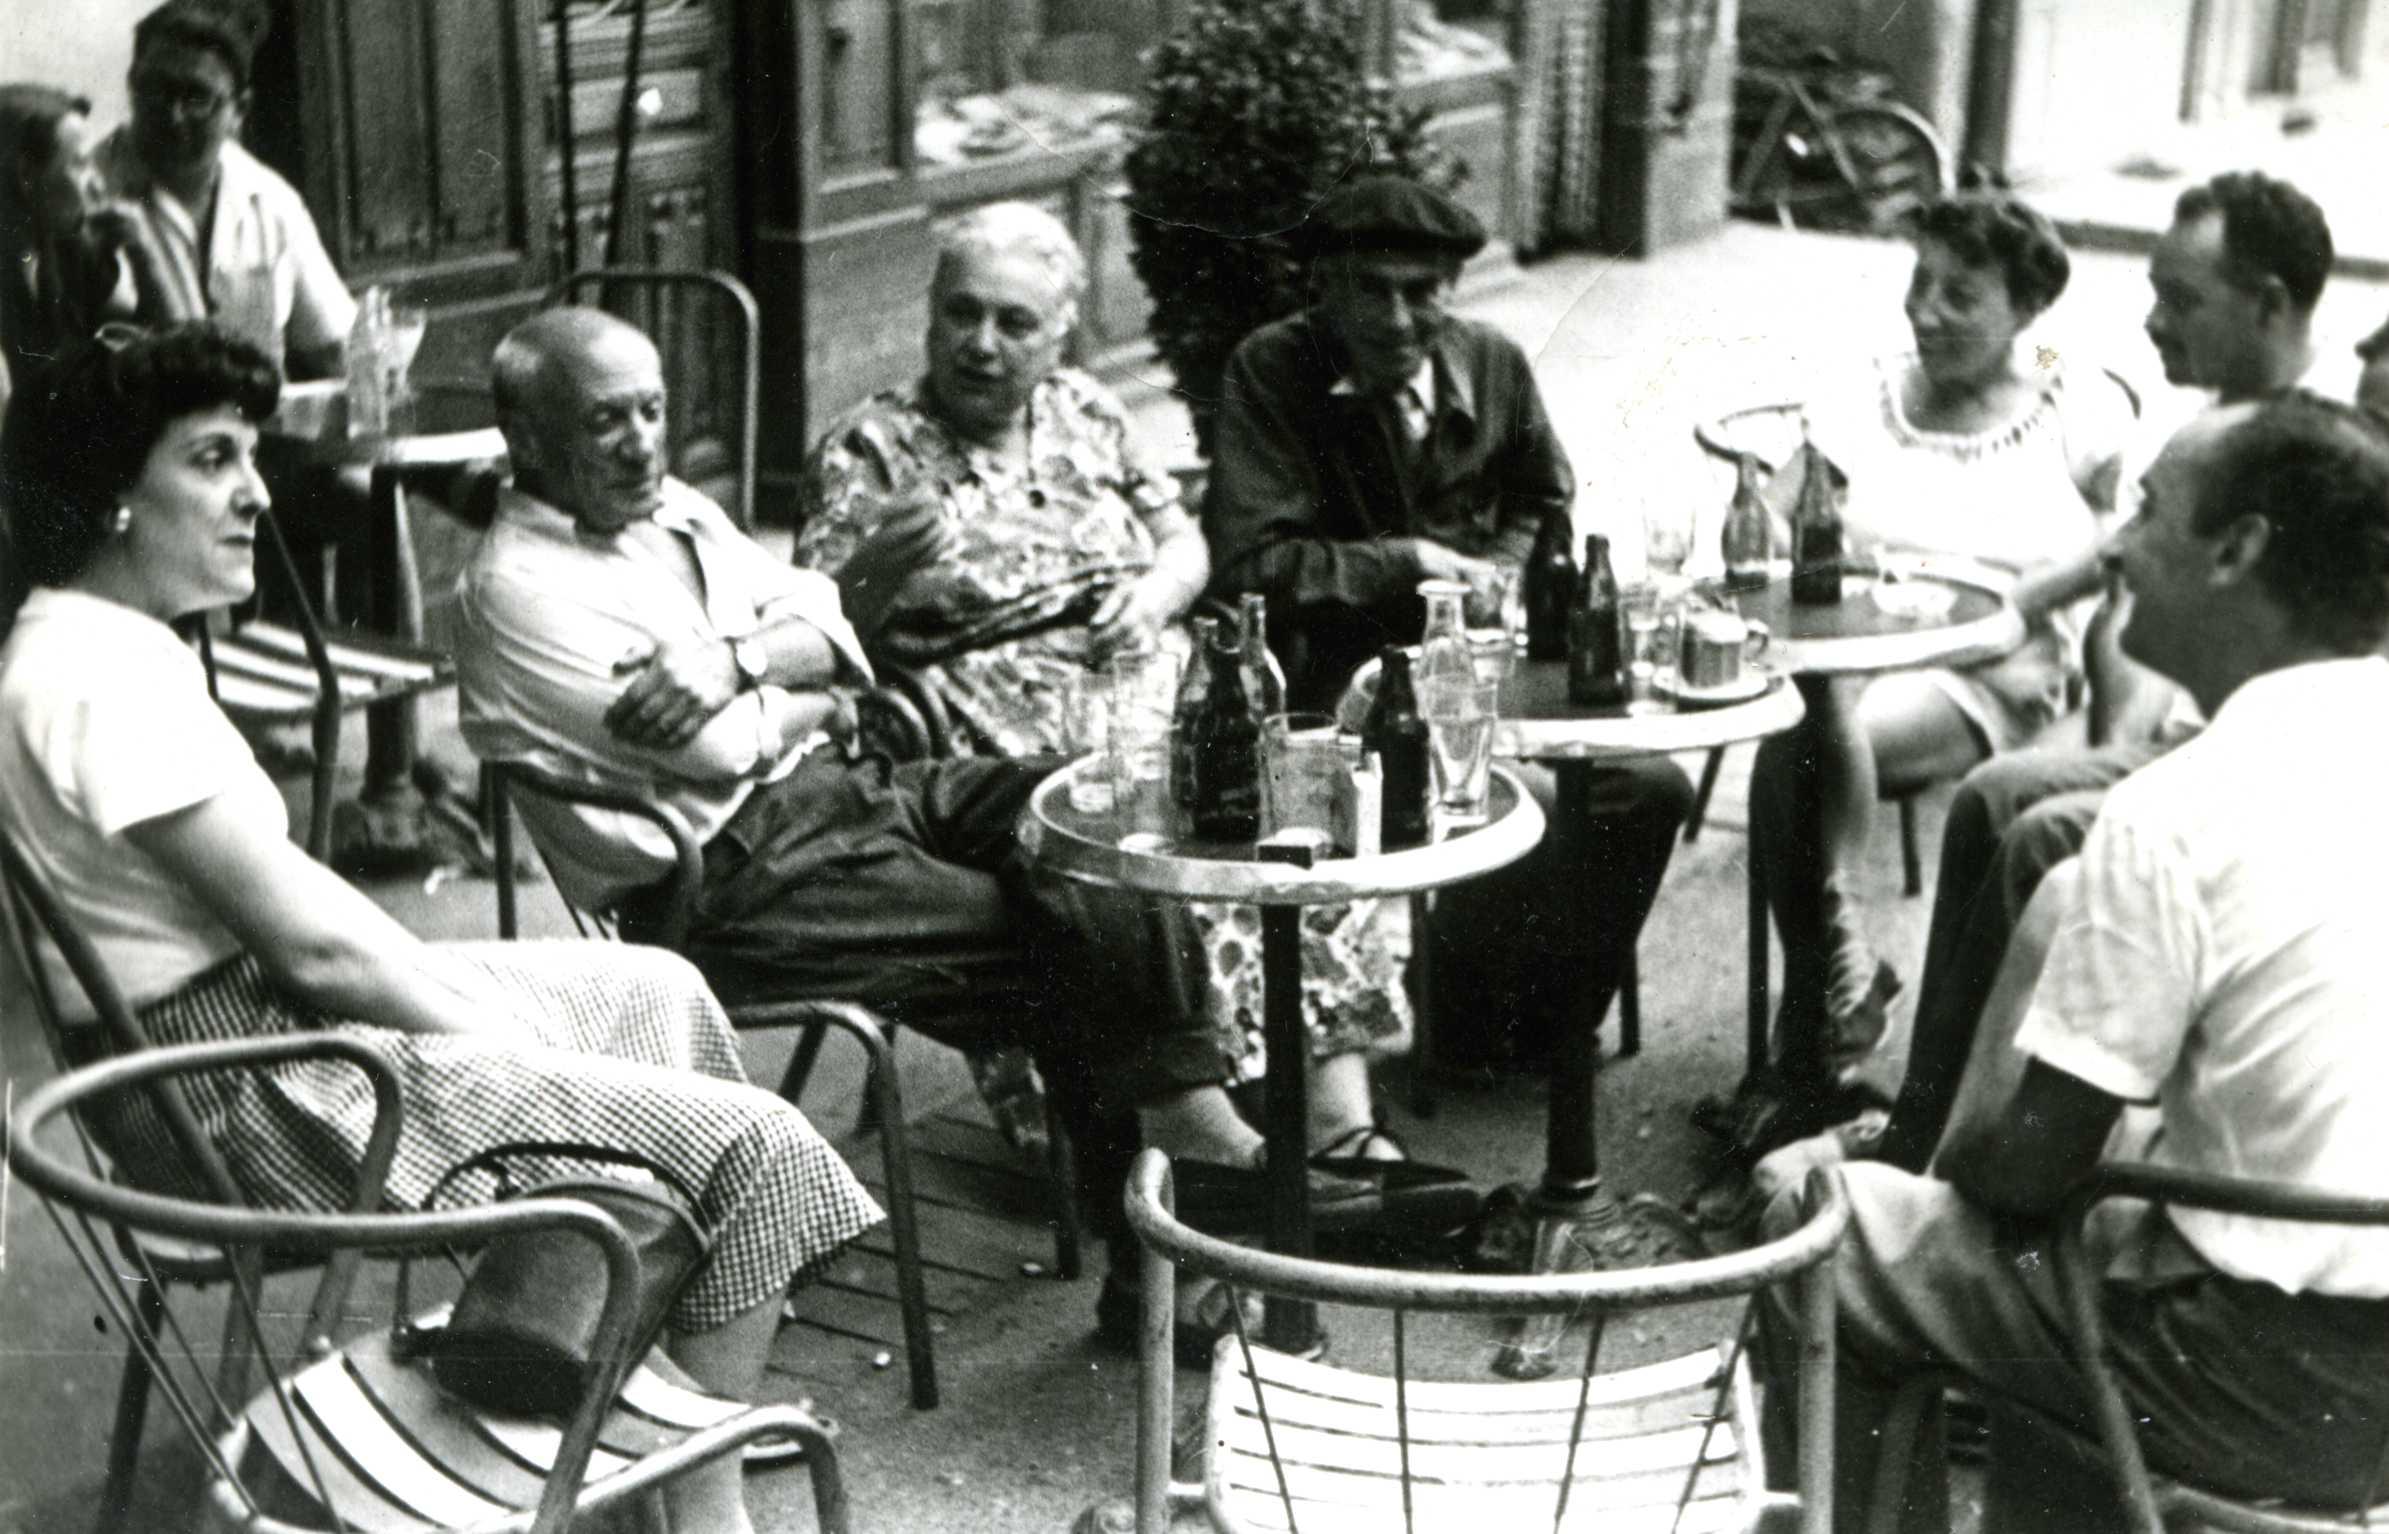 http://upload.wikimedia.org/wikipedia/commons/b/b7/Picasso,_Pierre,_Brune,et_Eudaldo.jpg